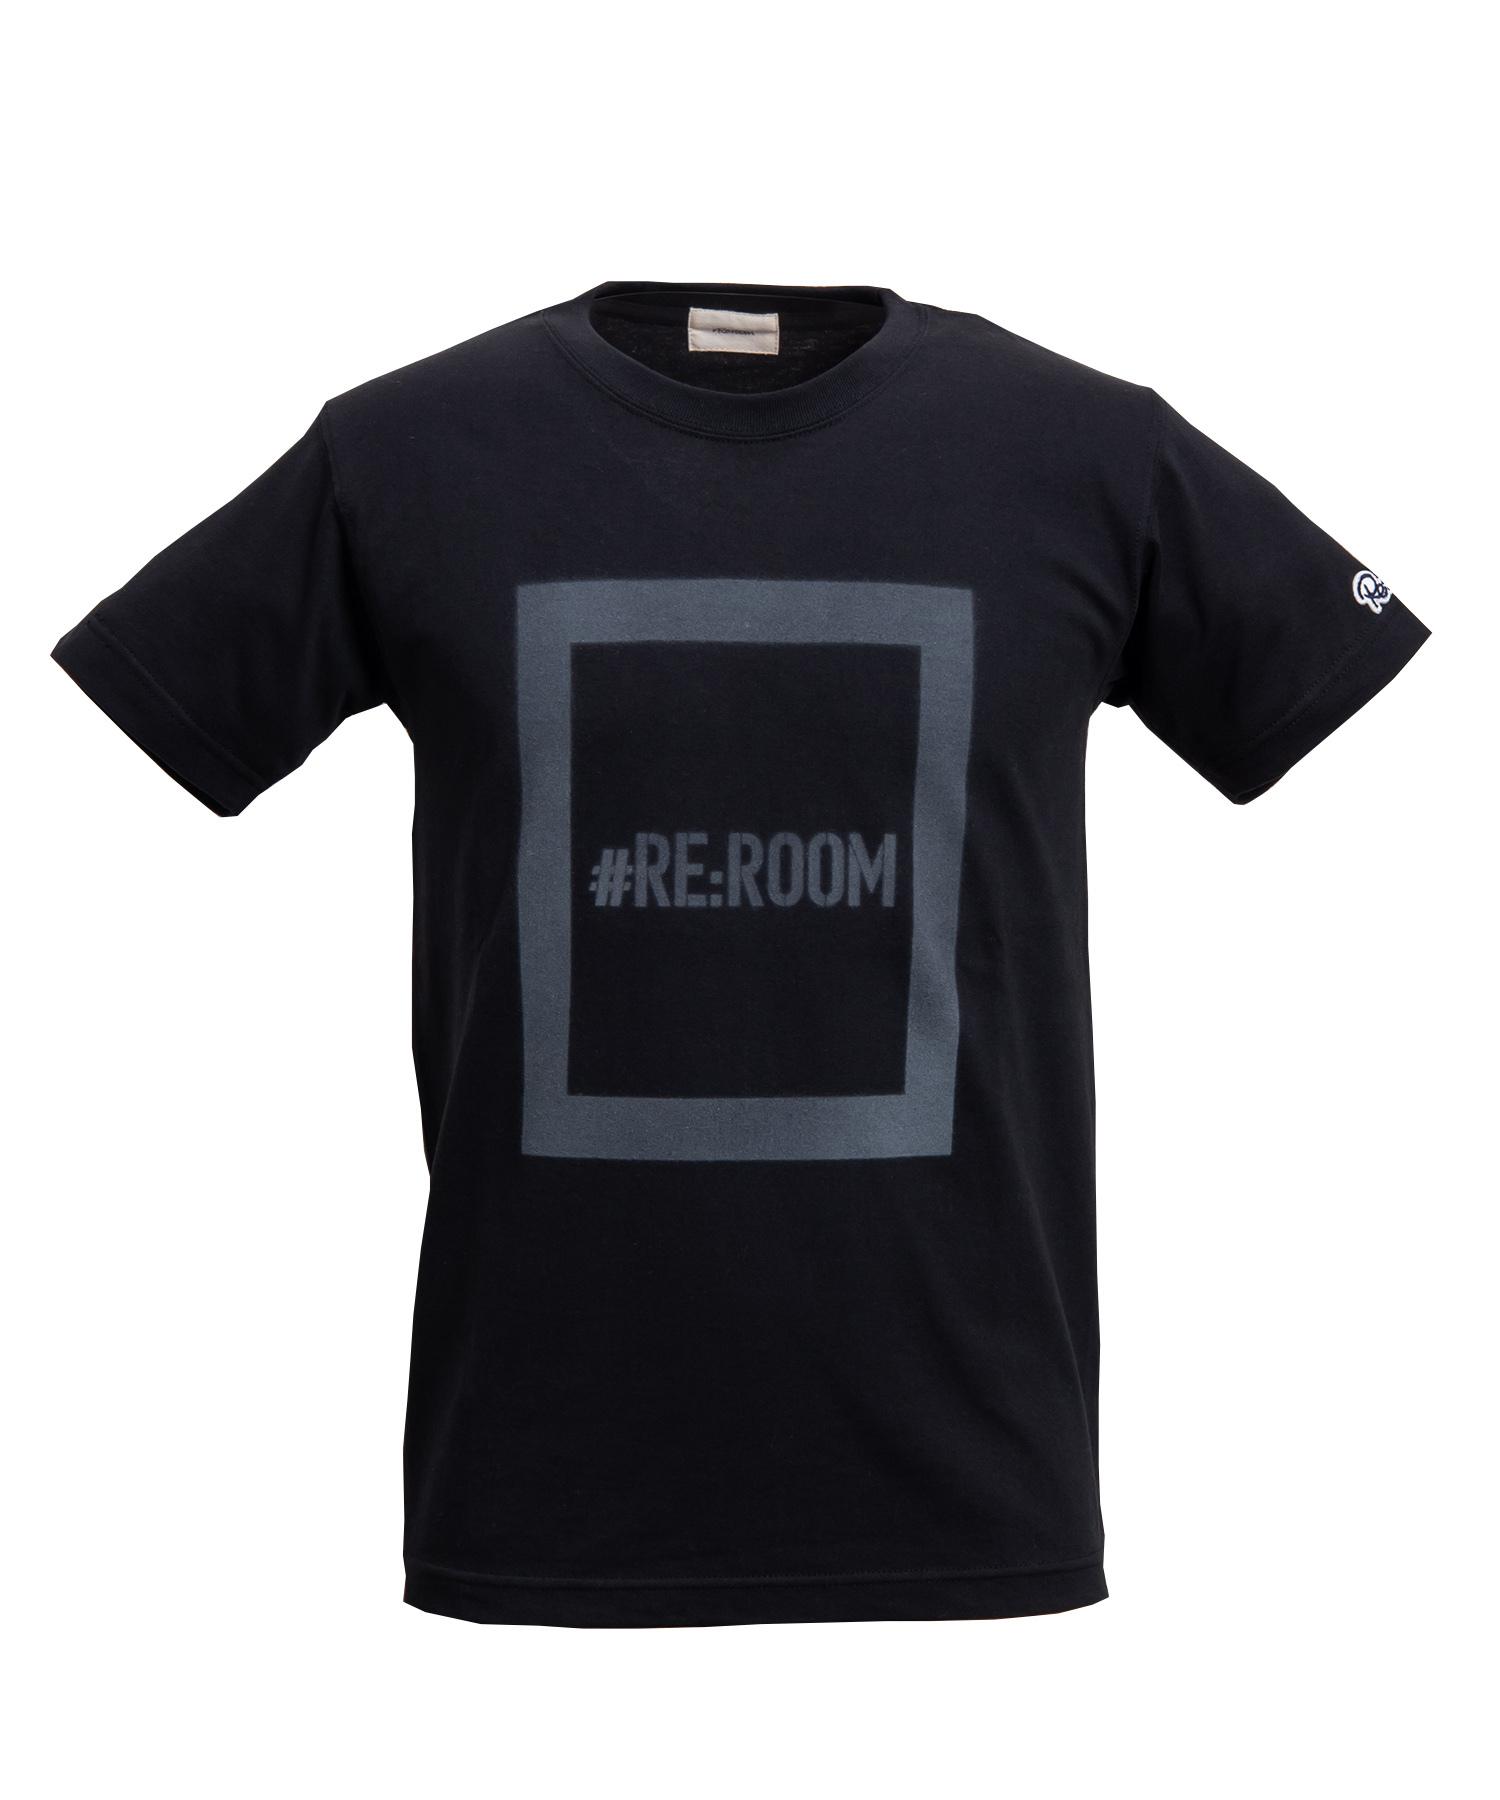 BOX LOGO SPRAY PRINT T-shirt[REC191]